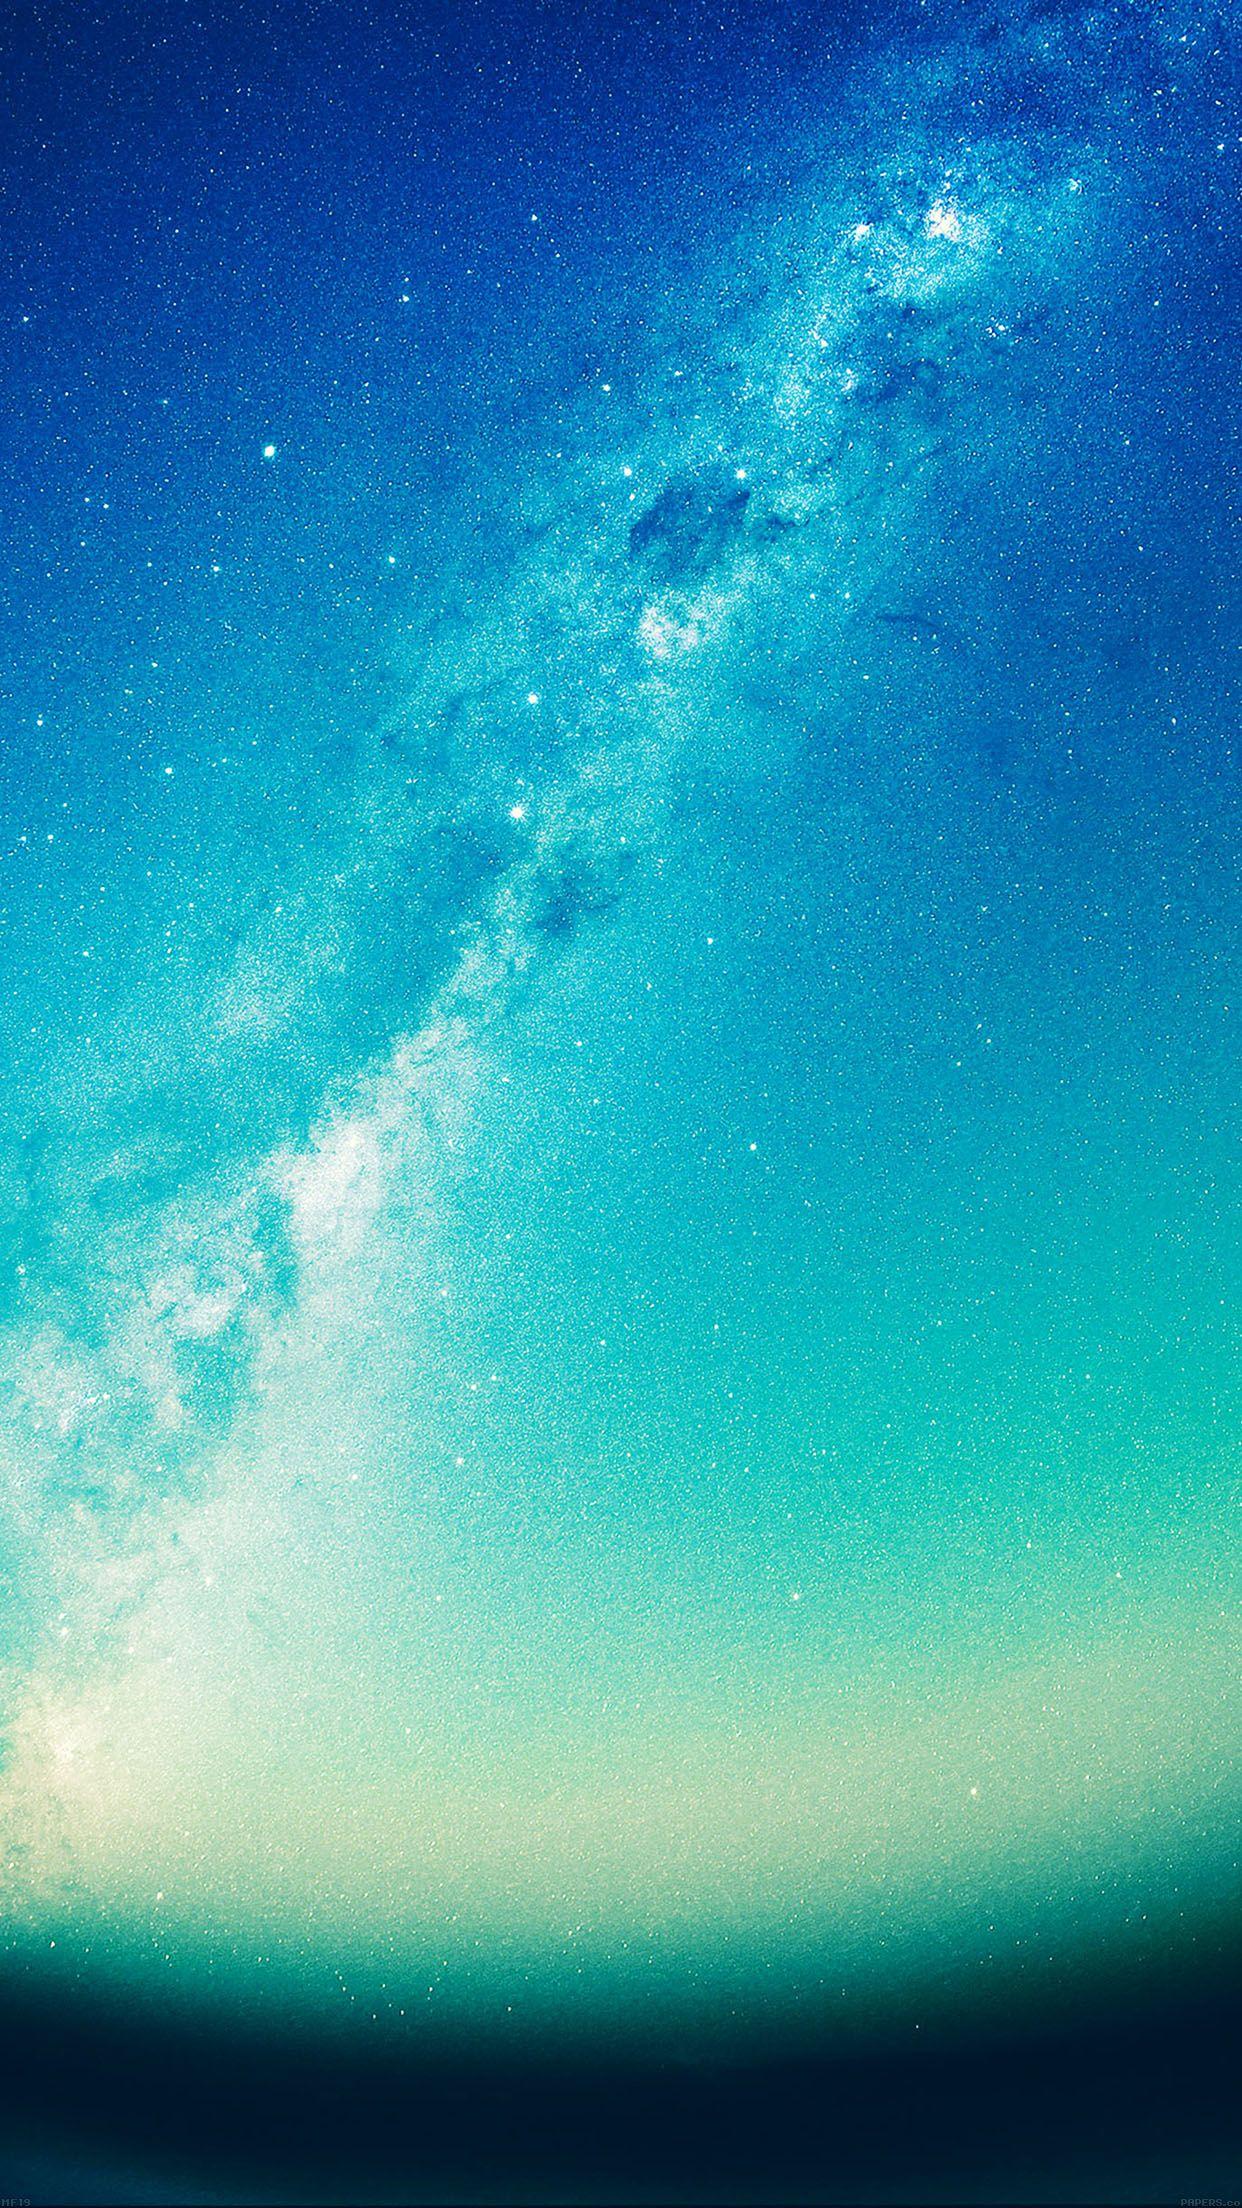 Galaxy image by Azra Safar Space iphone wallpaper, Ipad